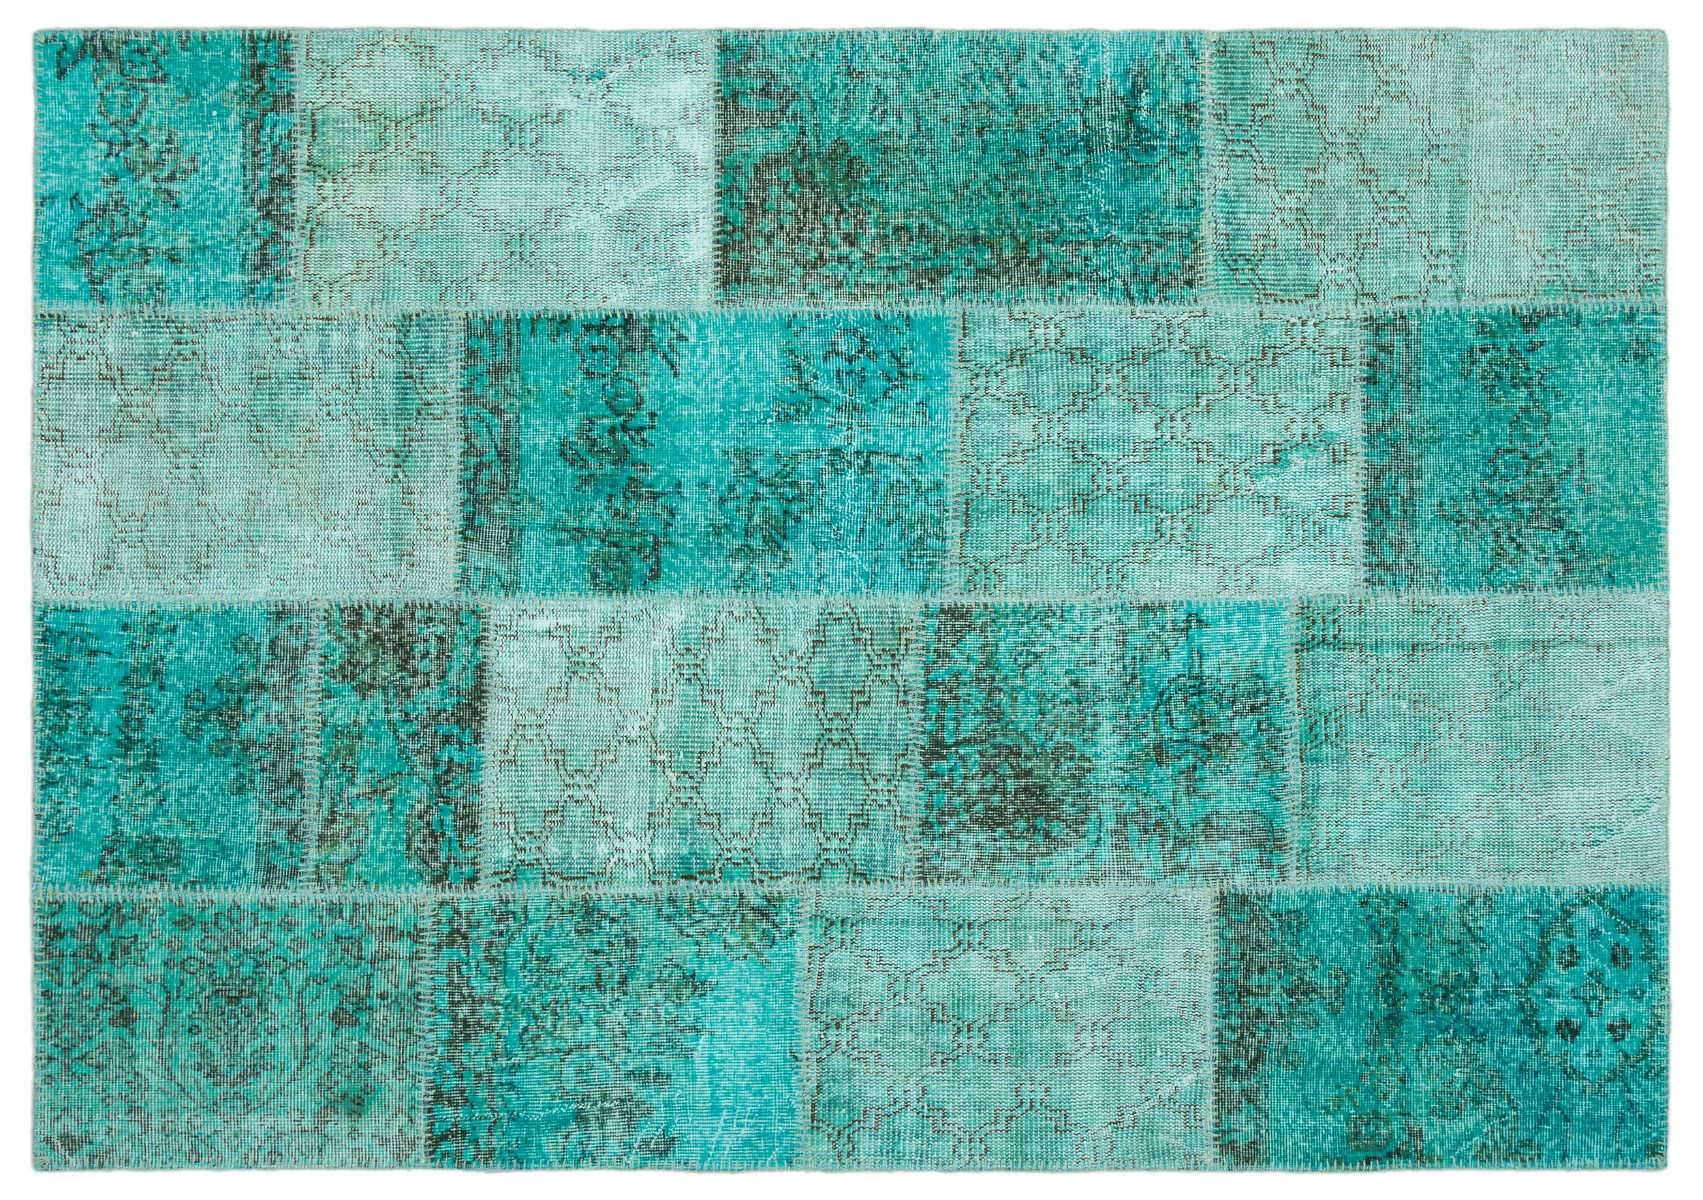 Patchwork vloerkleed turquoise nr.20642 231cm x 161cm